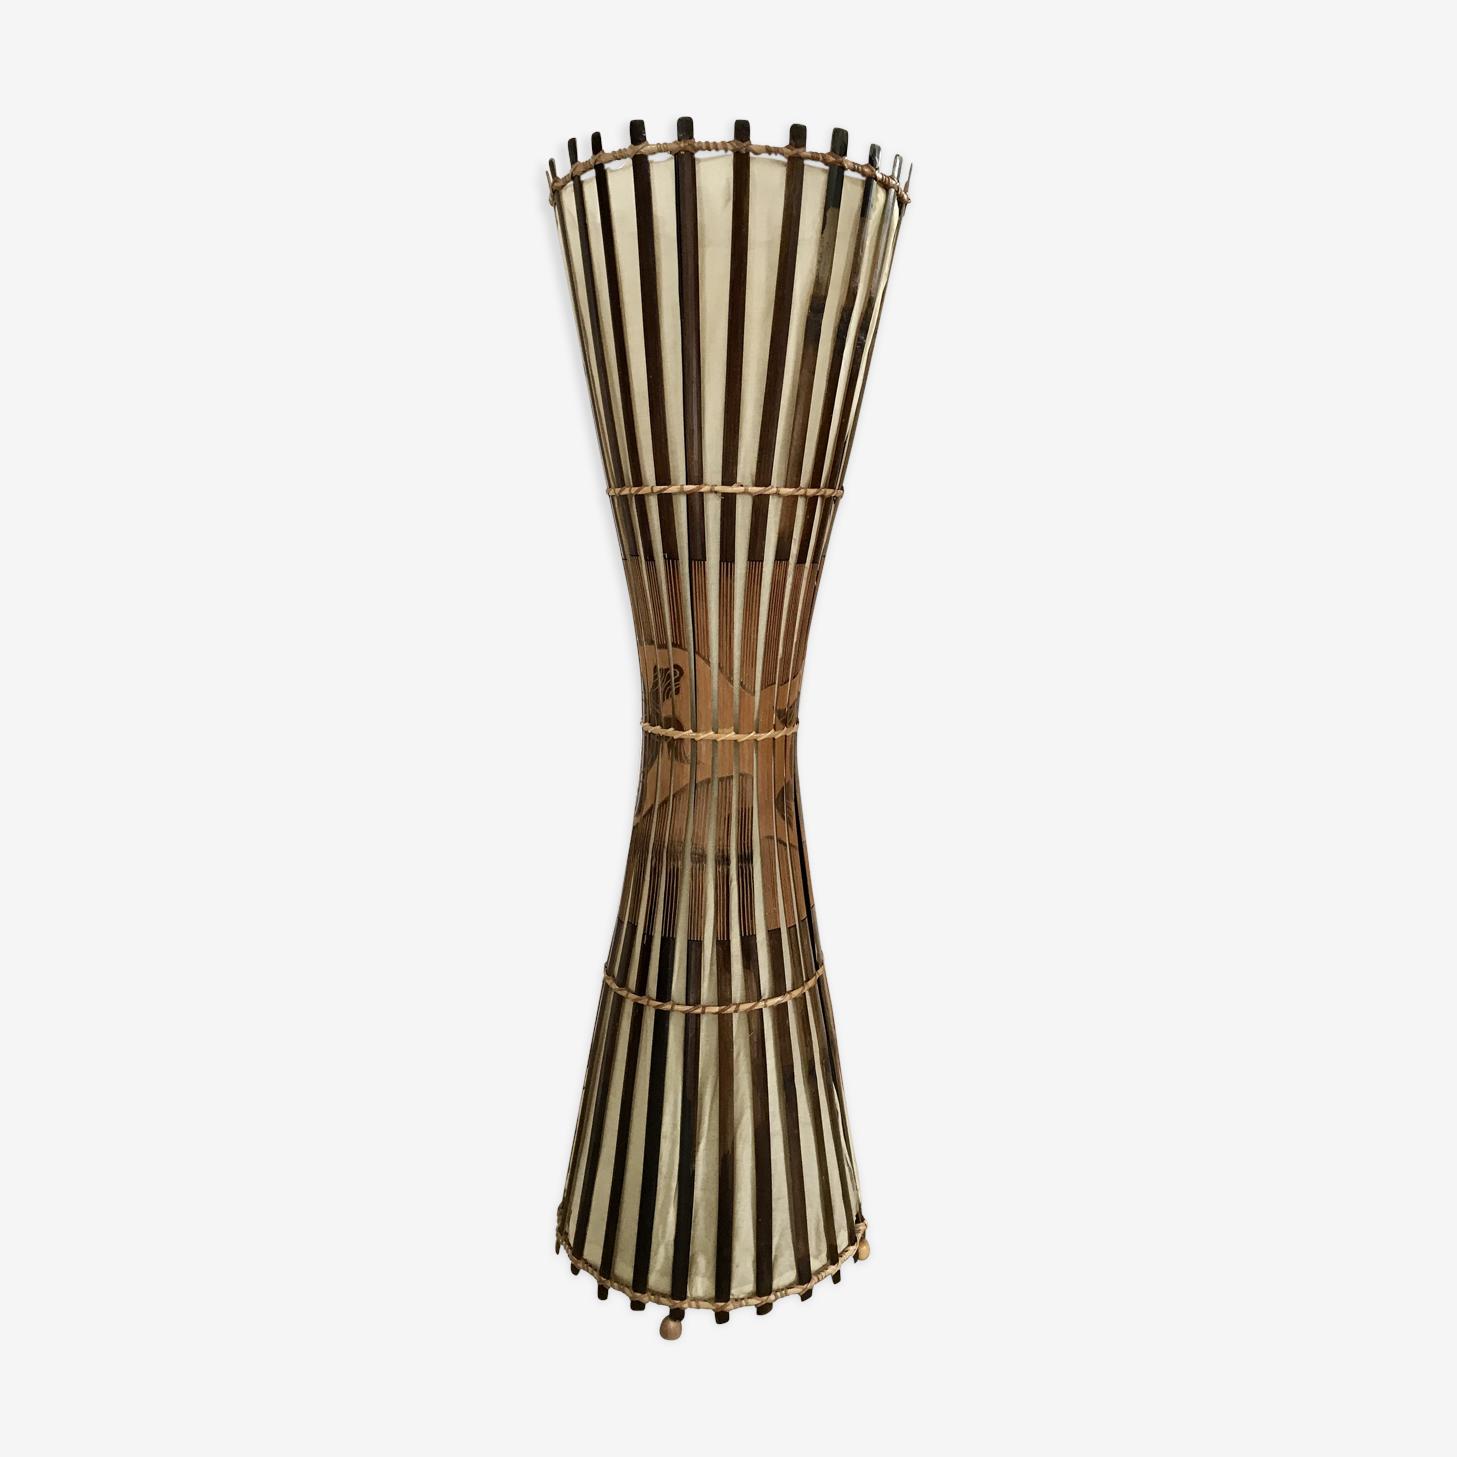 Lampadaire vintage bambou et rotin